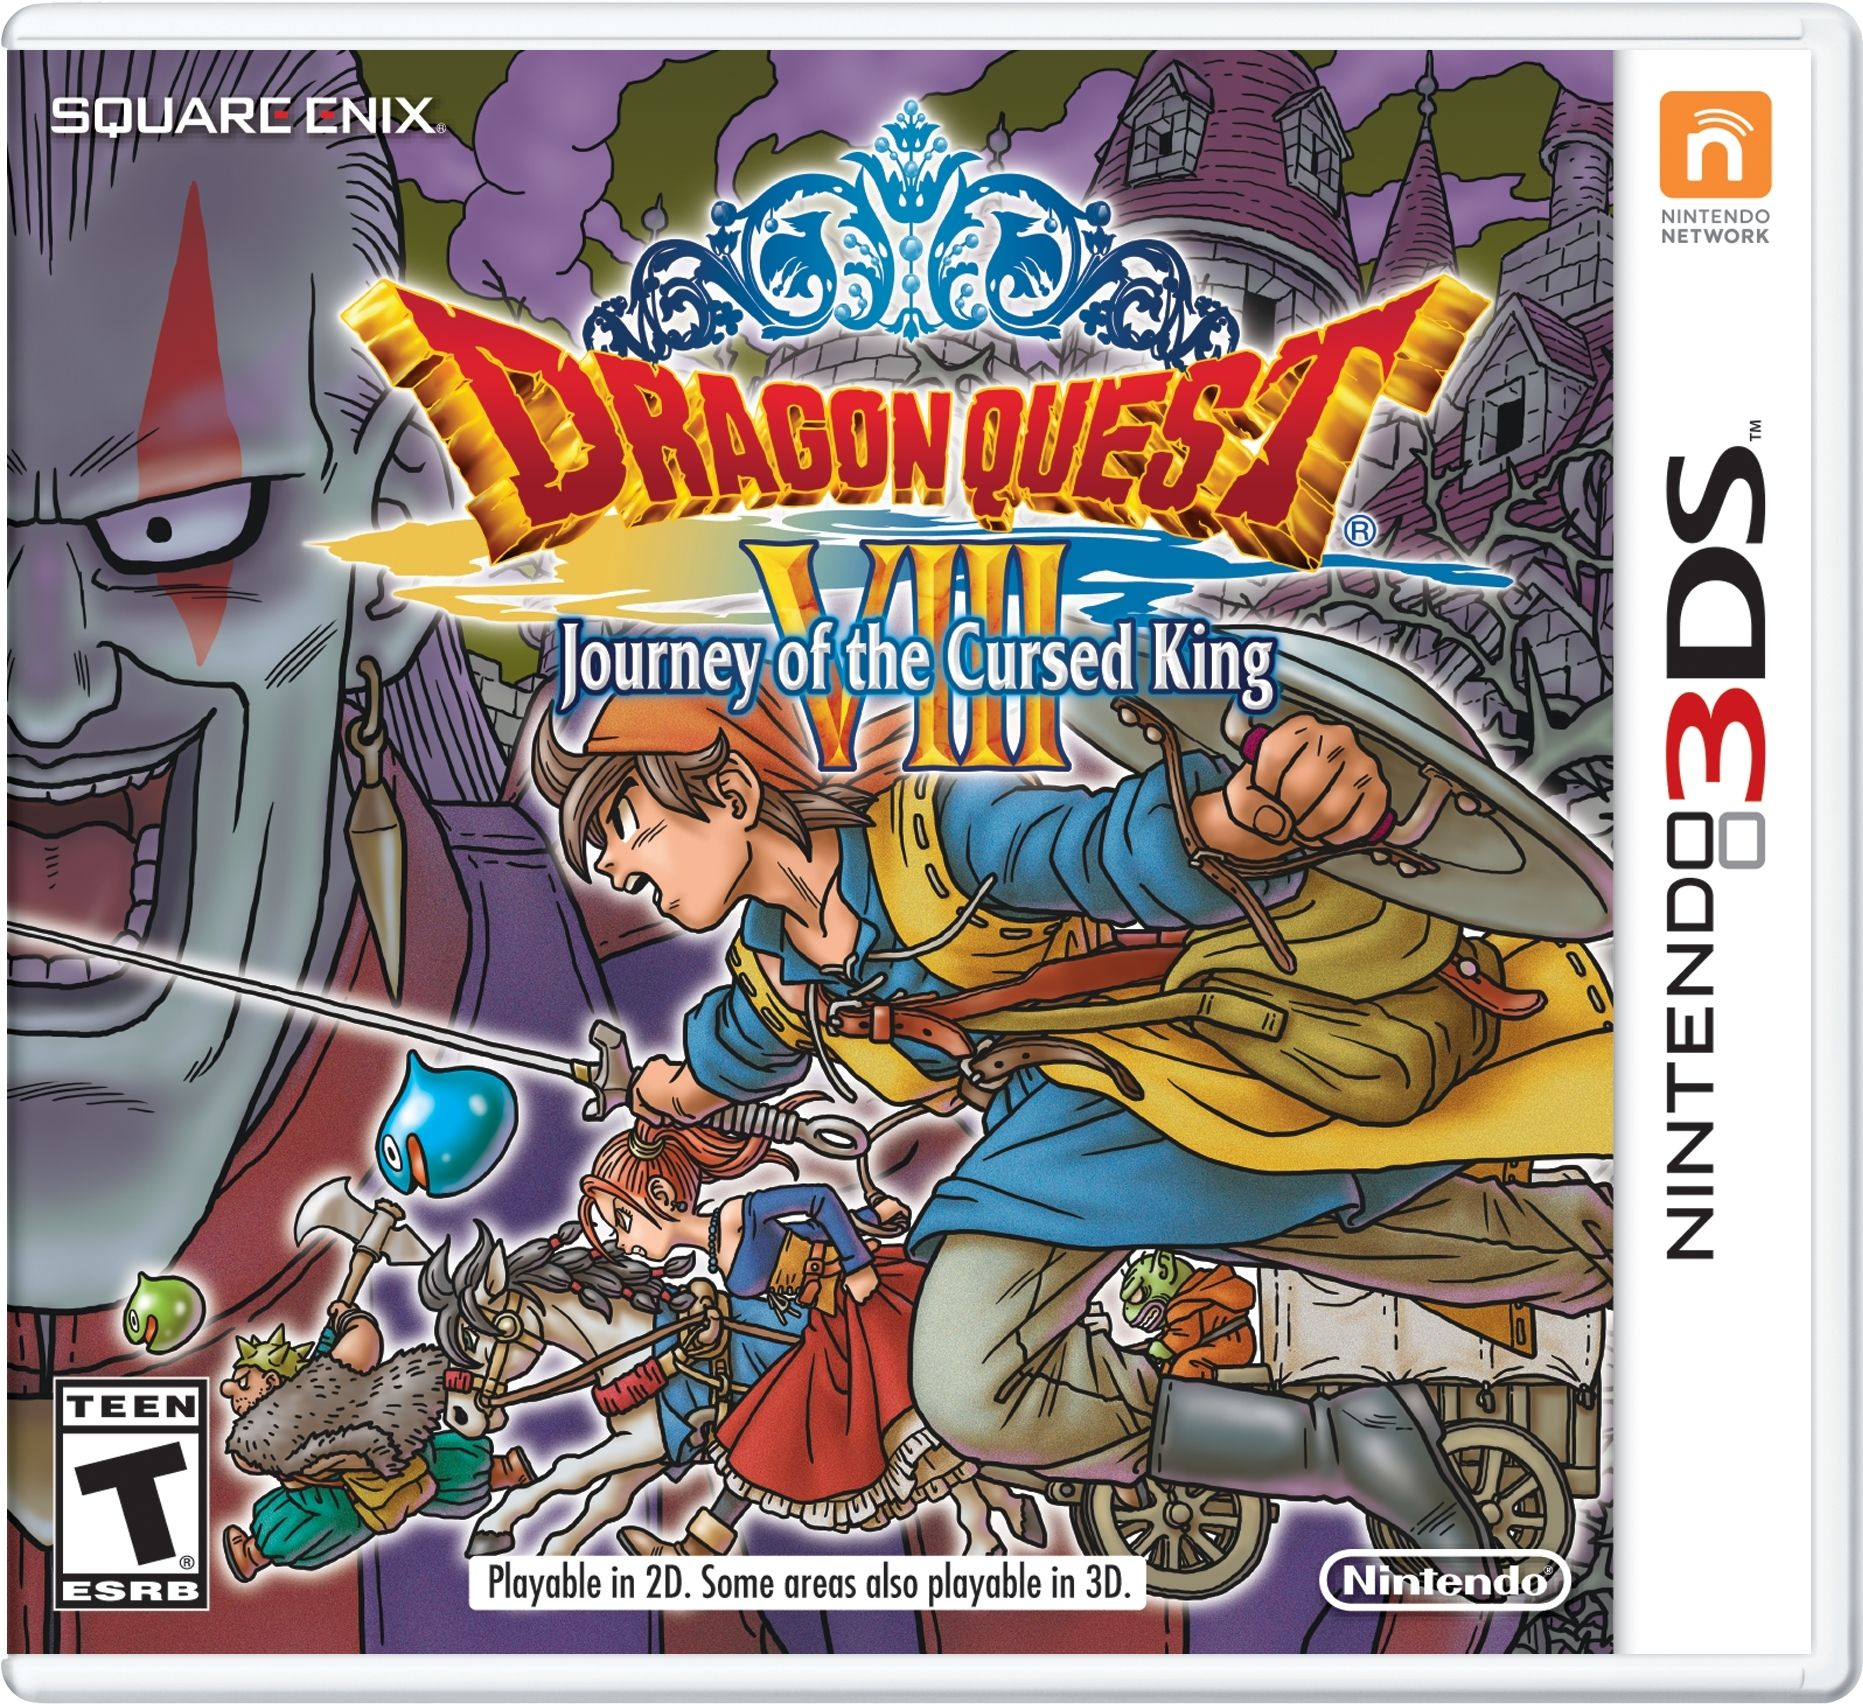 Dragon Quest VIII dorazí na 3DS už 20. ledna 133146